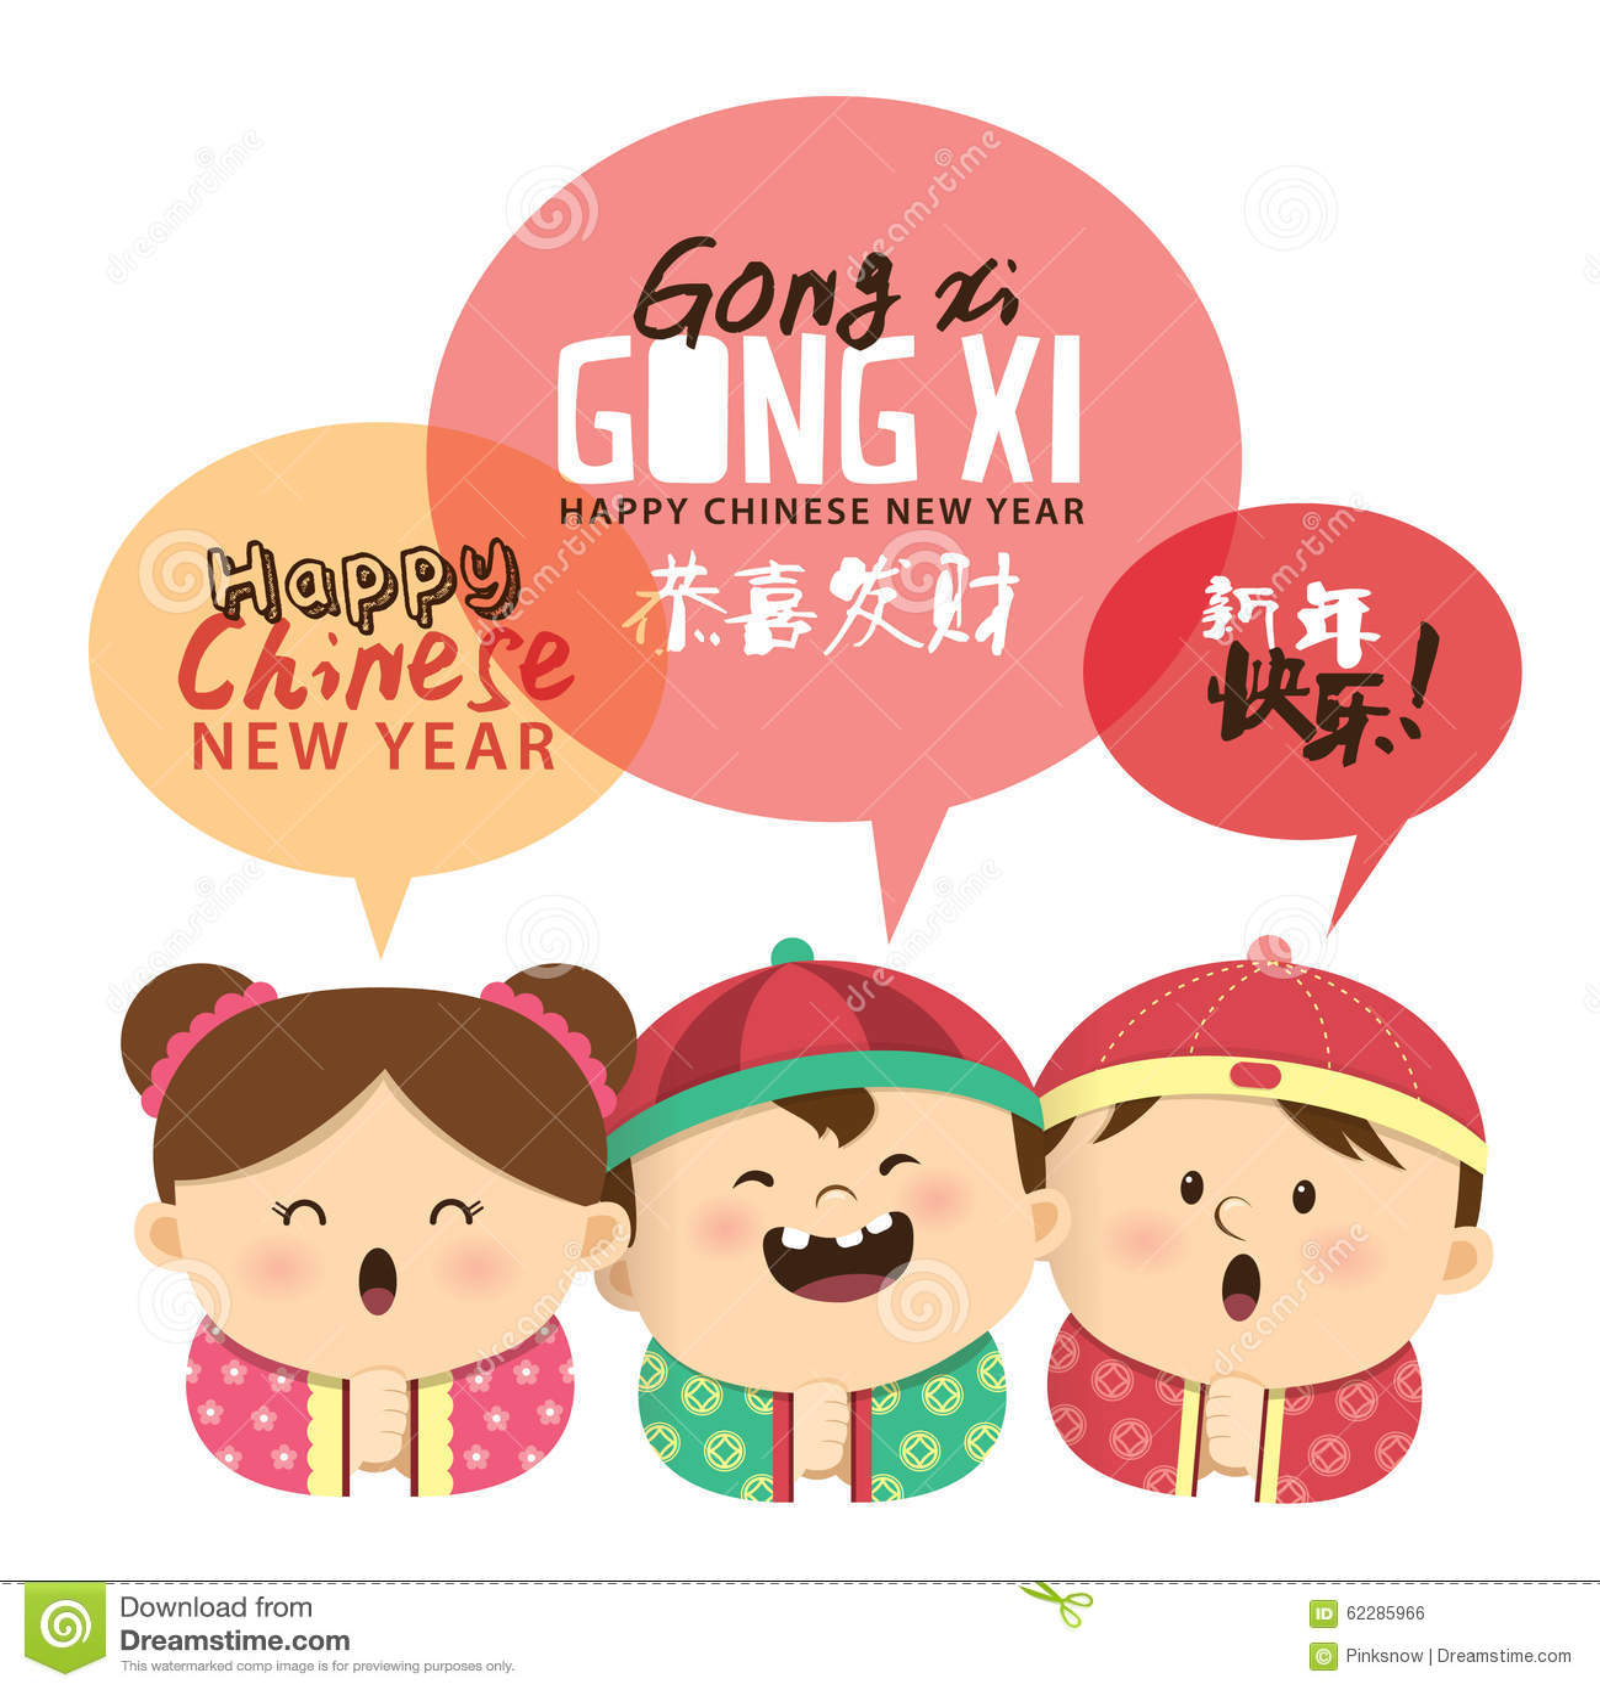 How to write happy lunar new year in korean wowknee m4hsunfo